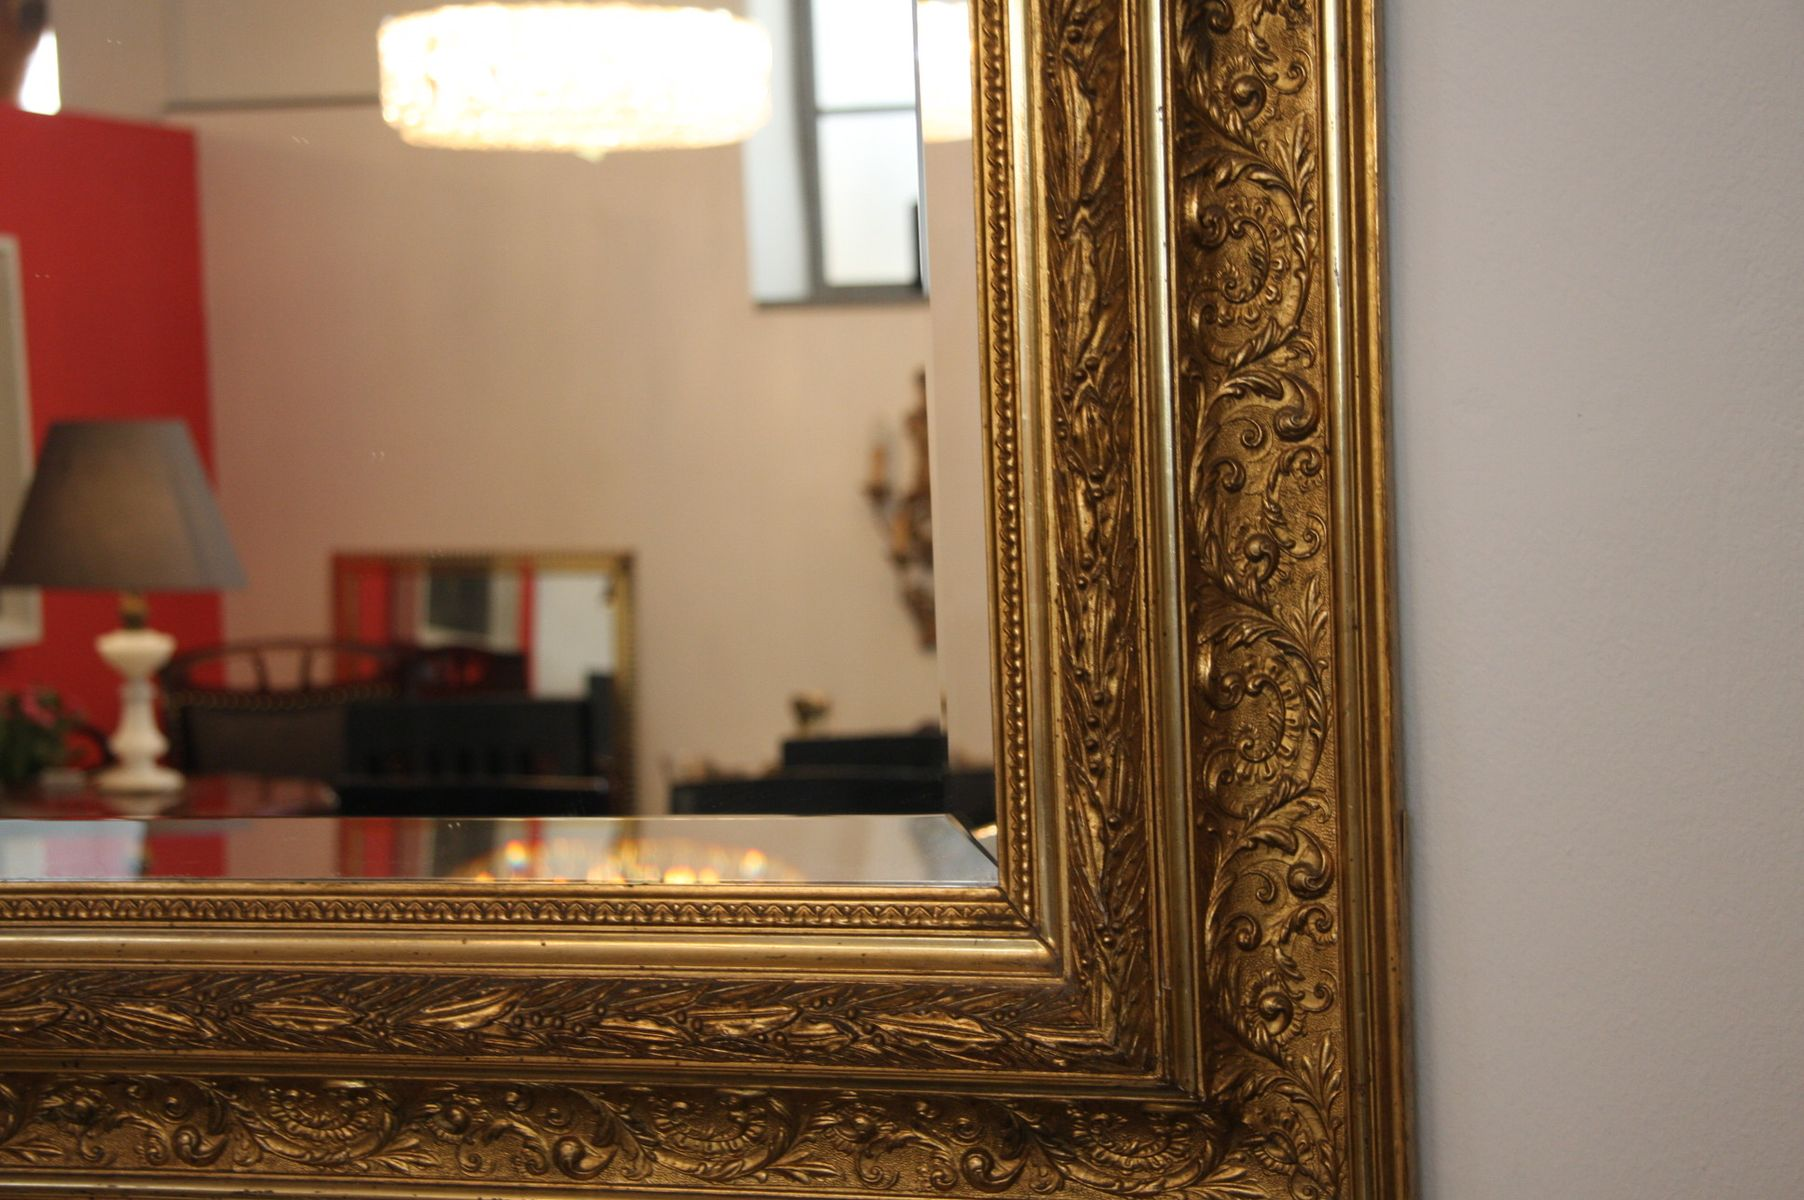 Groer Spiegel Mit Rahmen. Free X Silberner Groer Wand